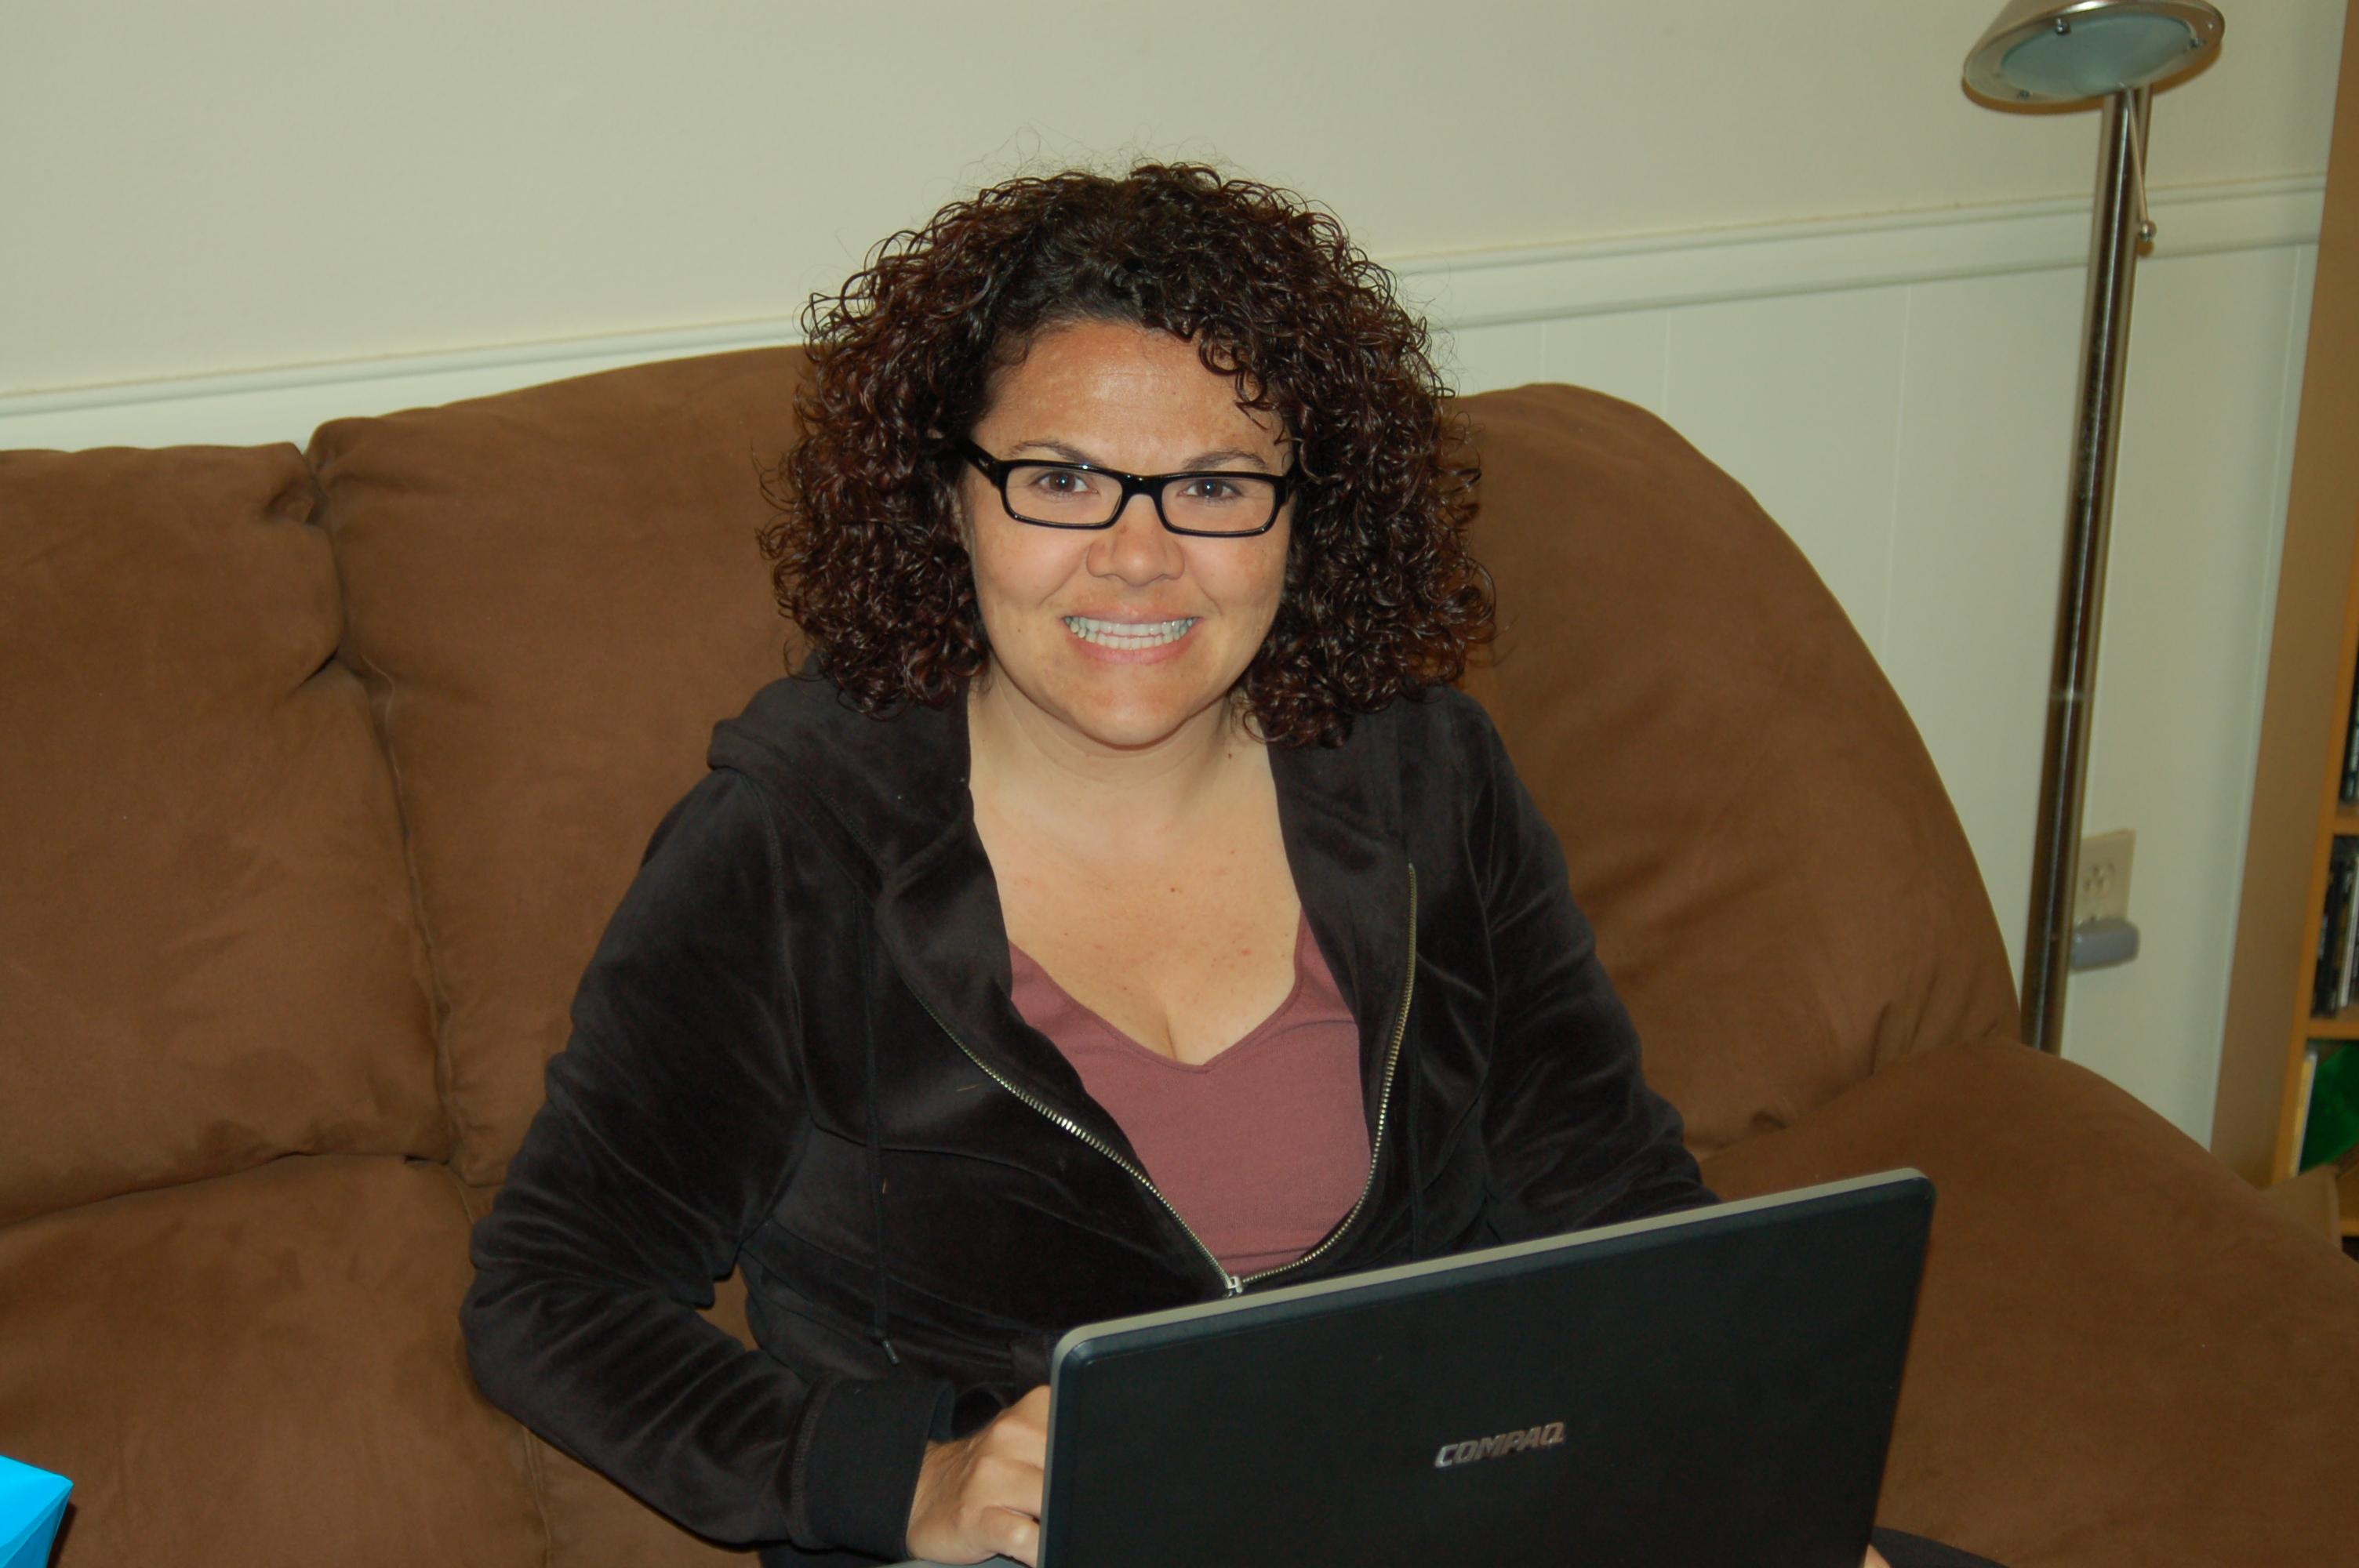 Sharon Jimenez Meyers